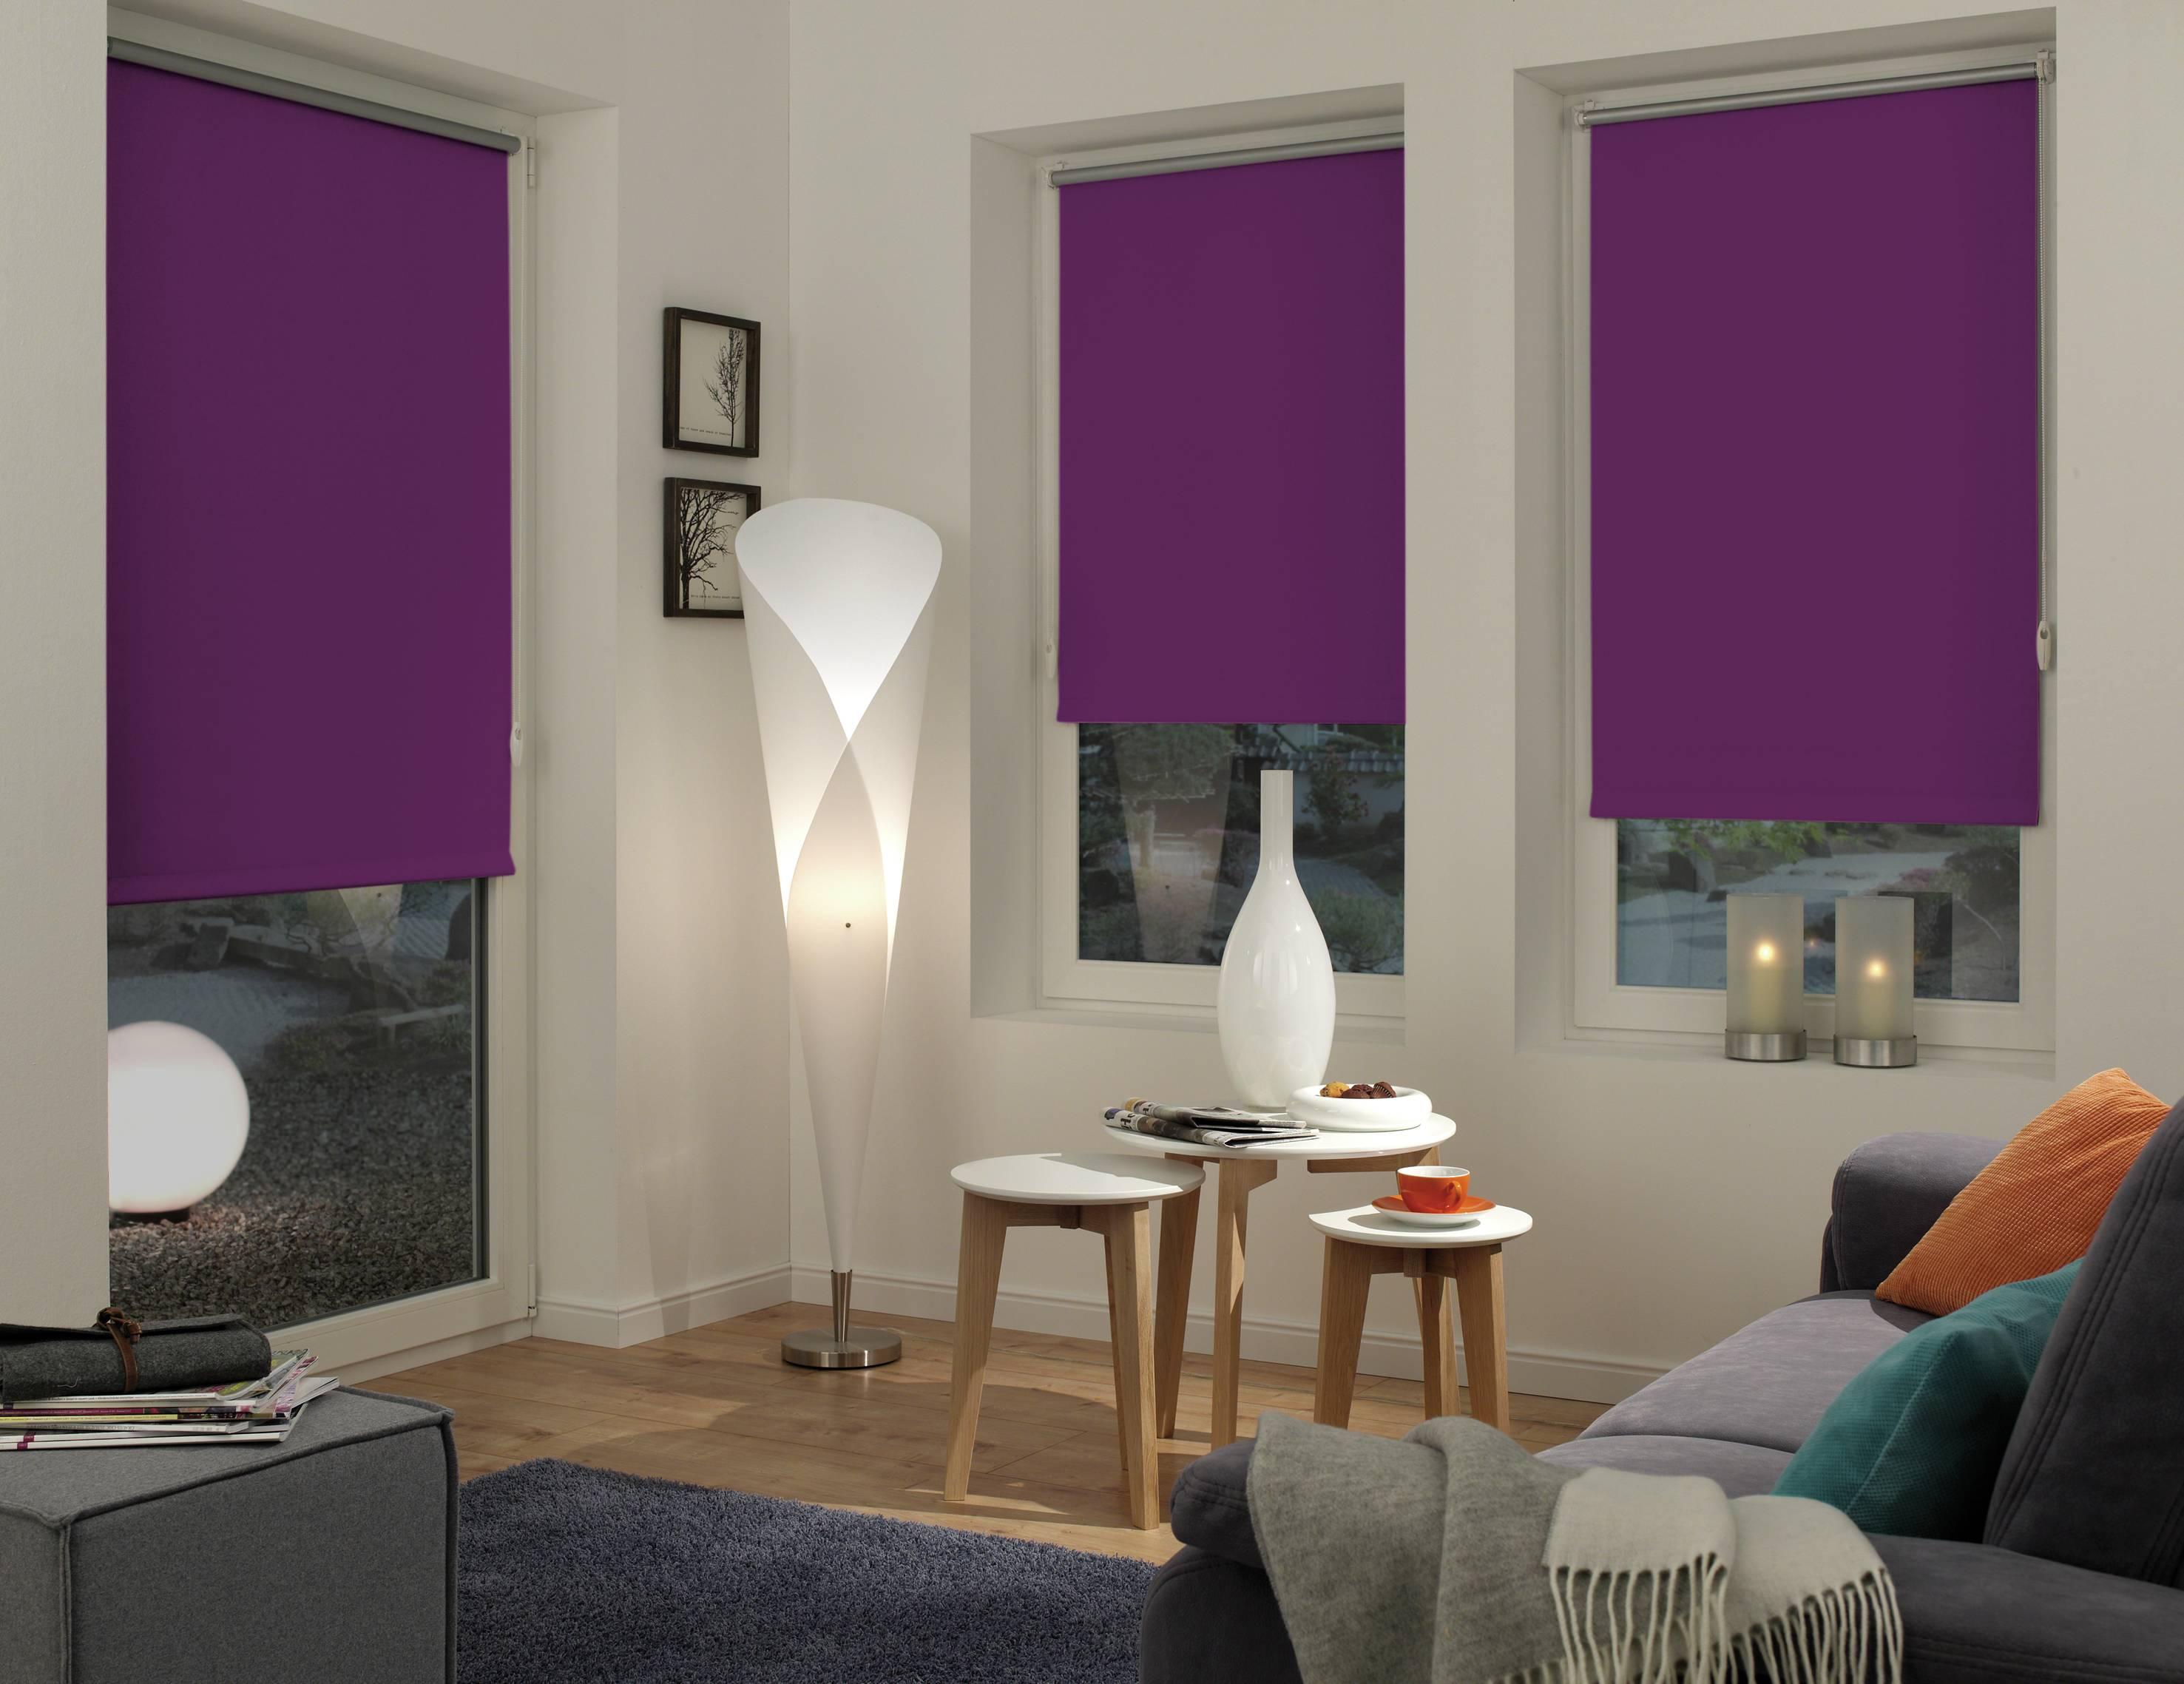 easyfix rollo thermo lila 75 x 150 cm 12548. Black Bedroom Furniture Sets. Home Design Ideas